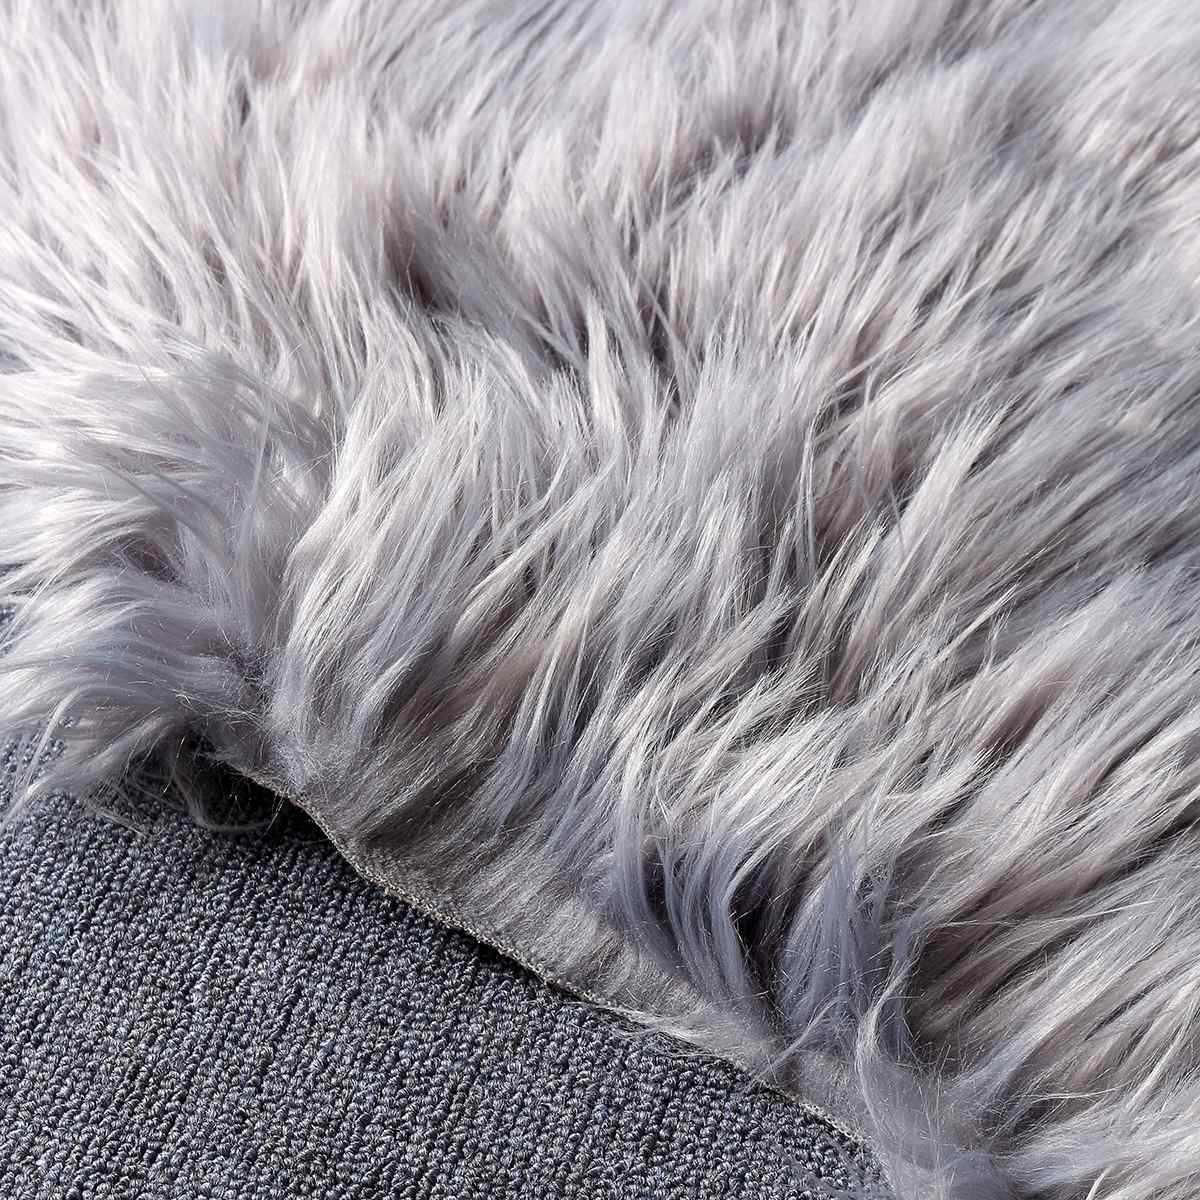 100cmX60cm 羊皮の敷物マットカーペットパッド椅子ソファ寝室の家の装飾寝室のどの毛皮の敷物